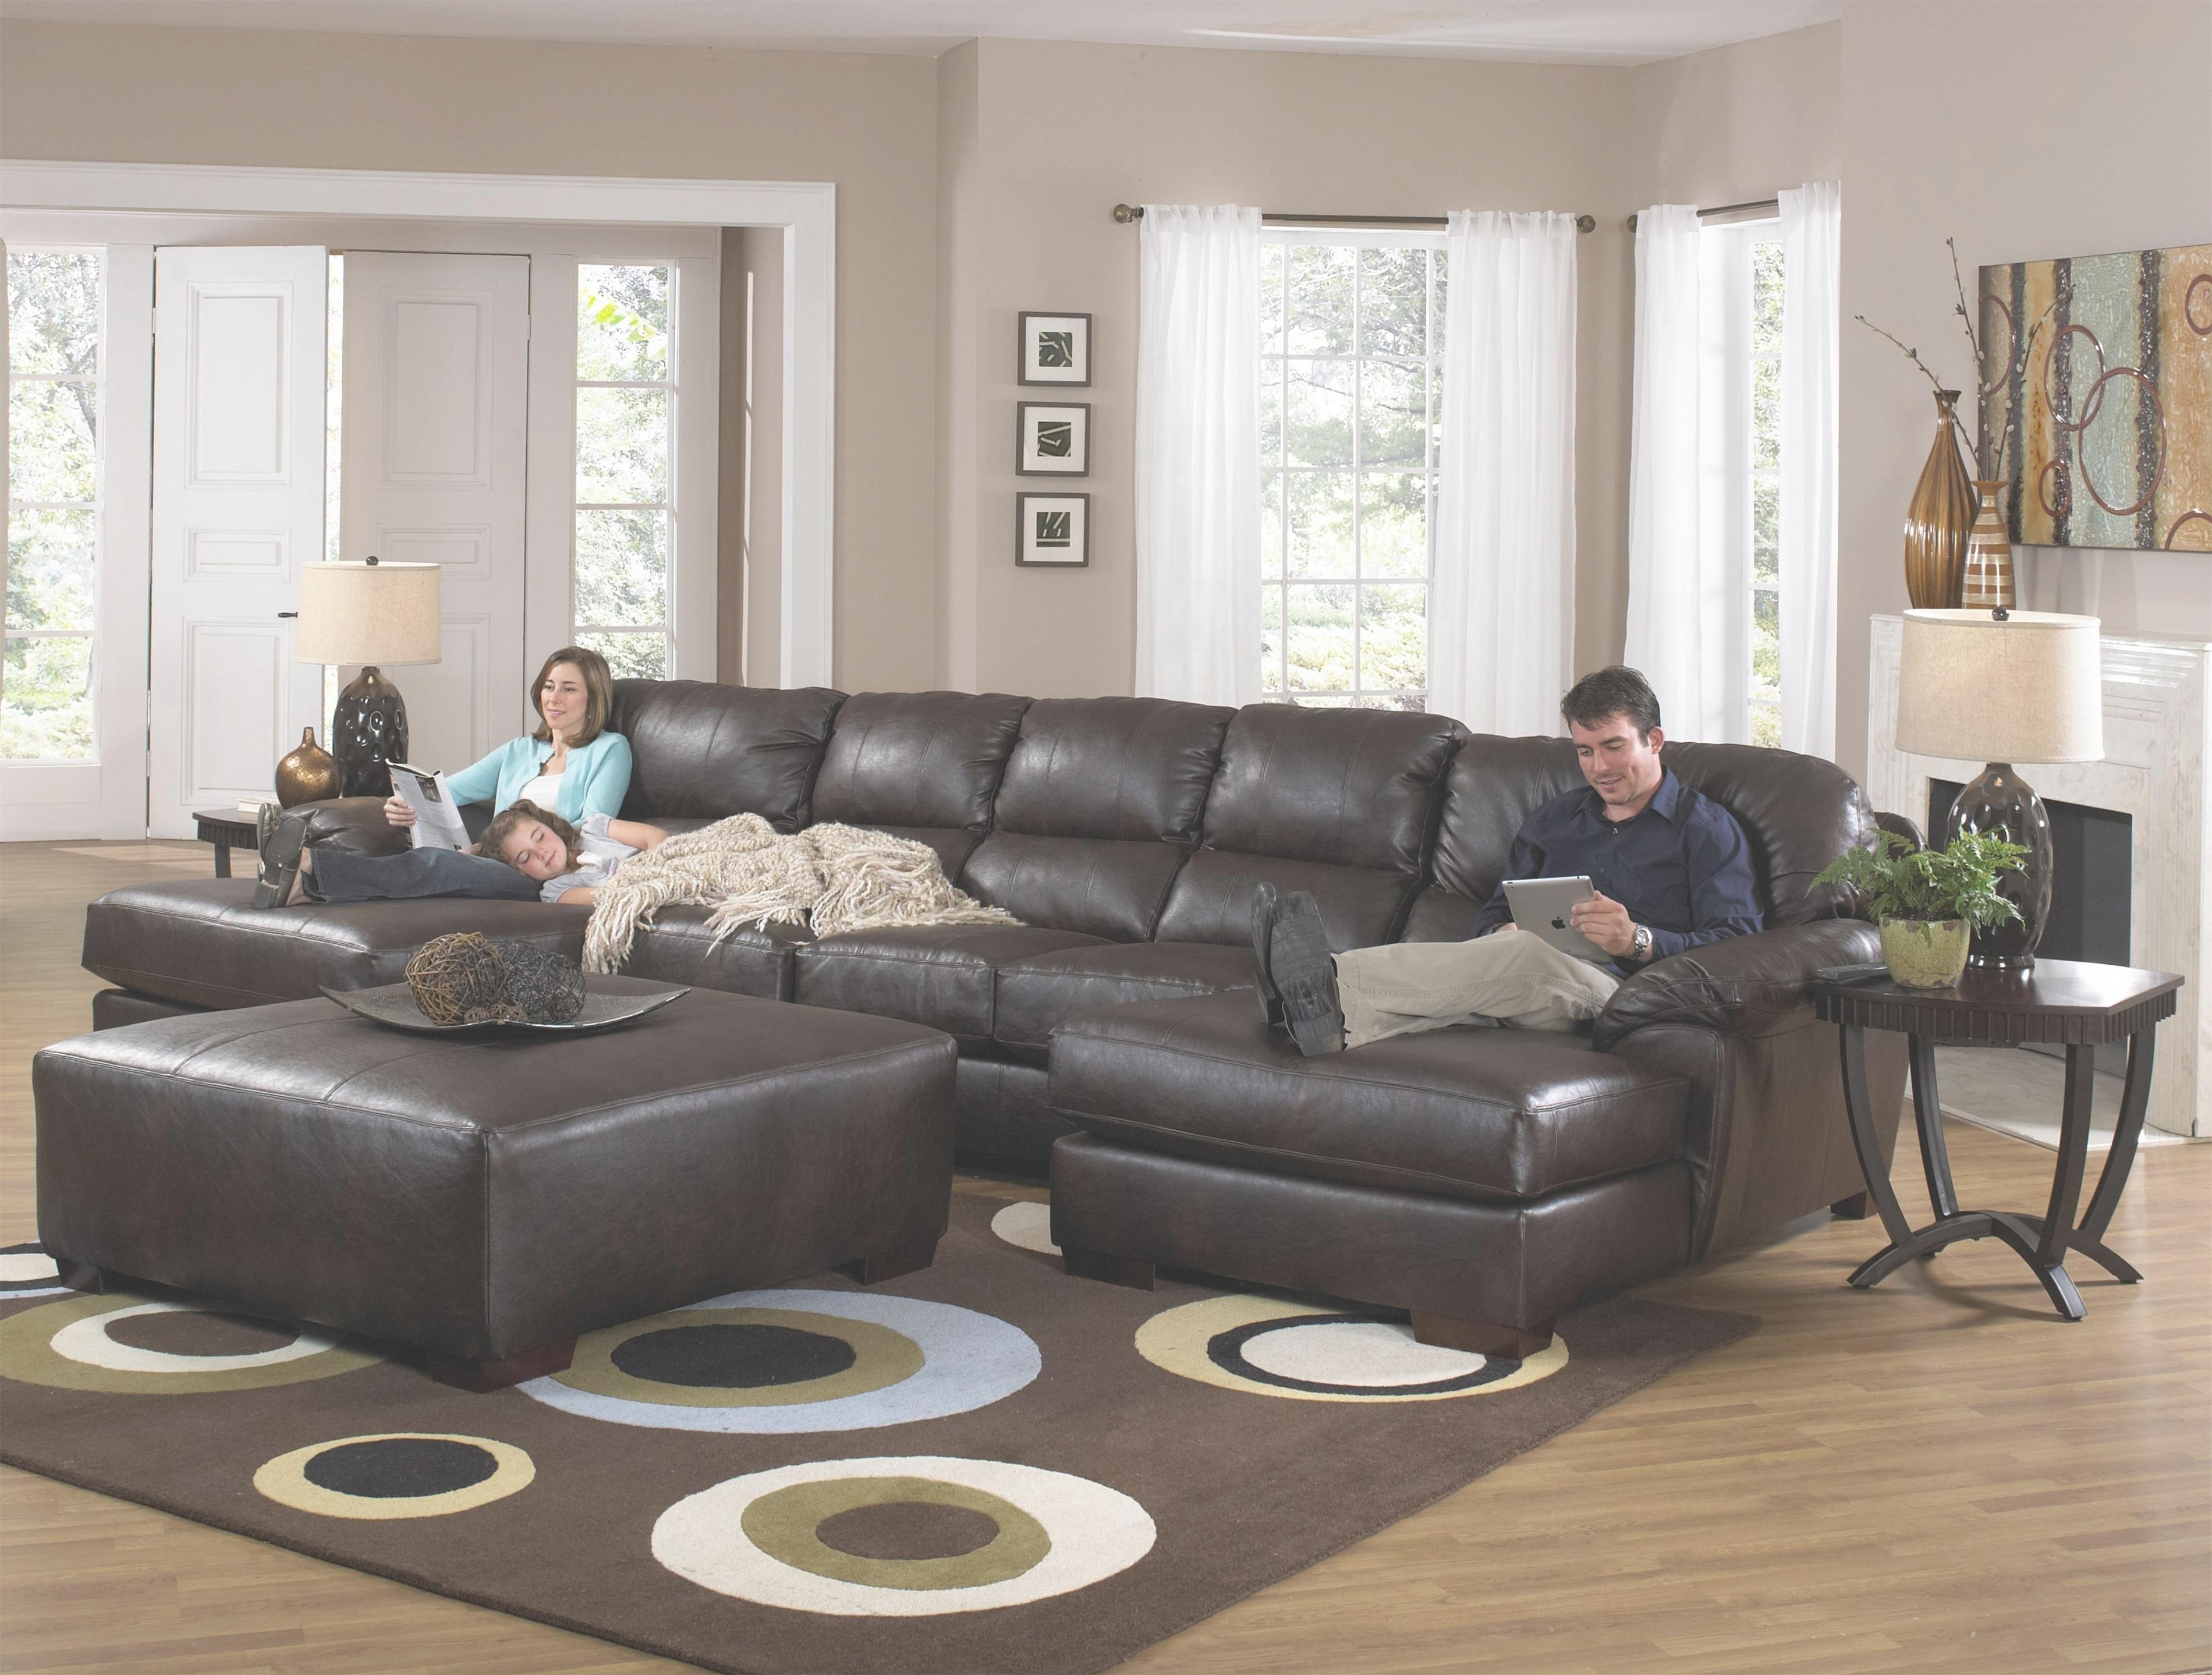 Margo Extra Wide Sectional Sofa Codeminimalist Within Extra Wide Sectional Sofas (View 14 of 15)